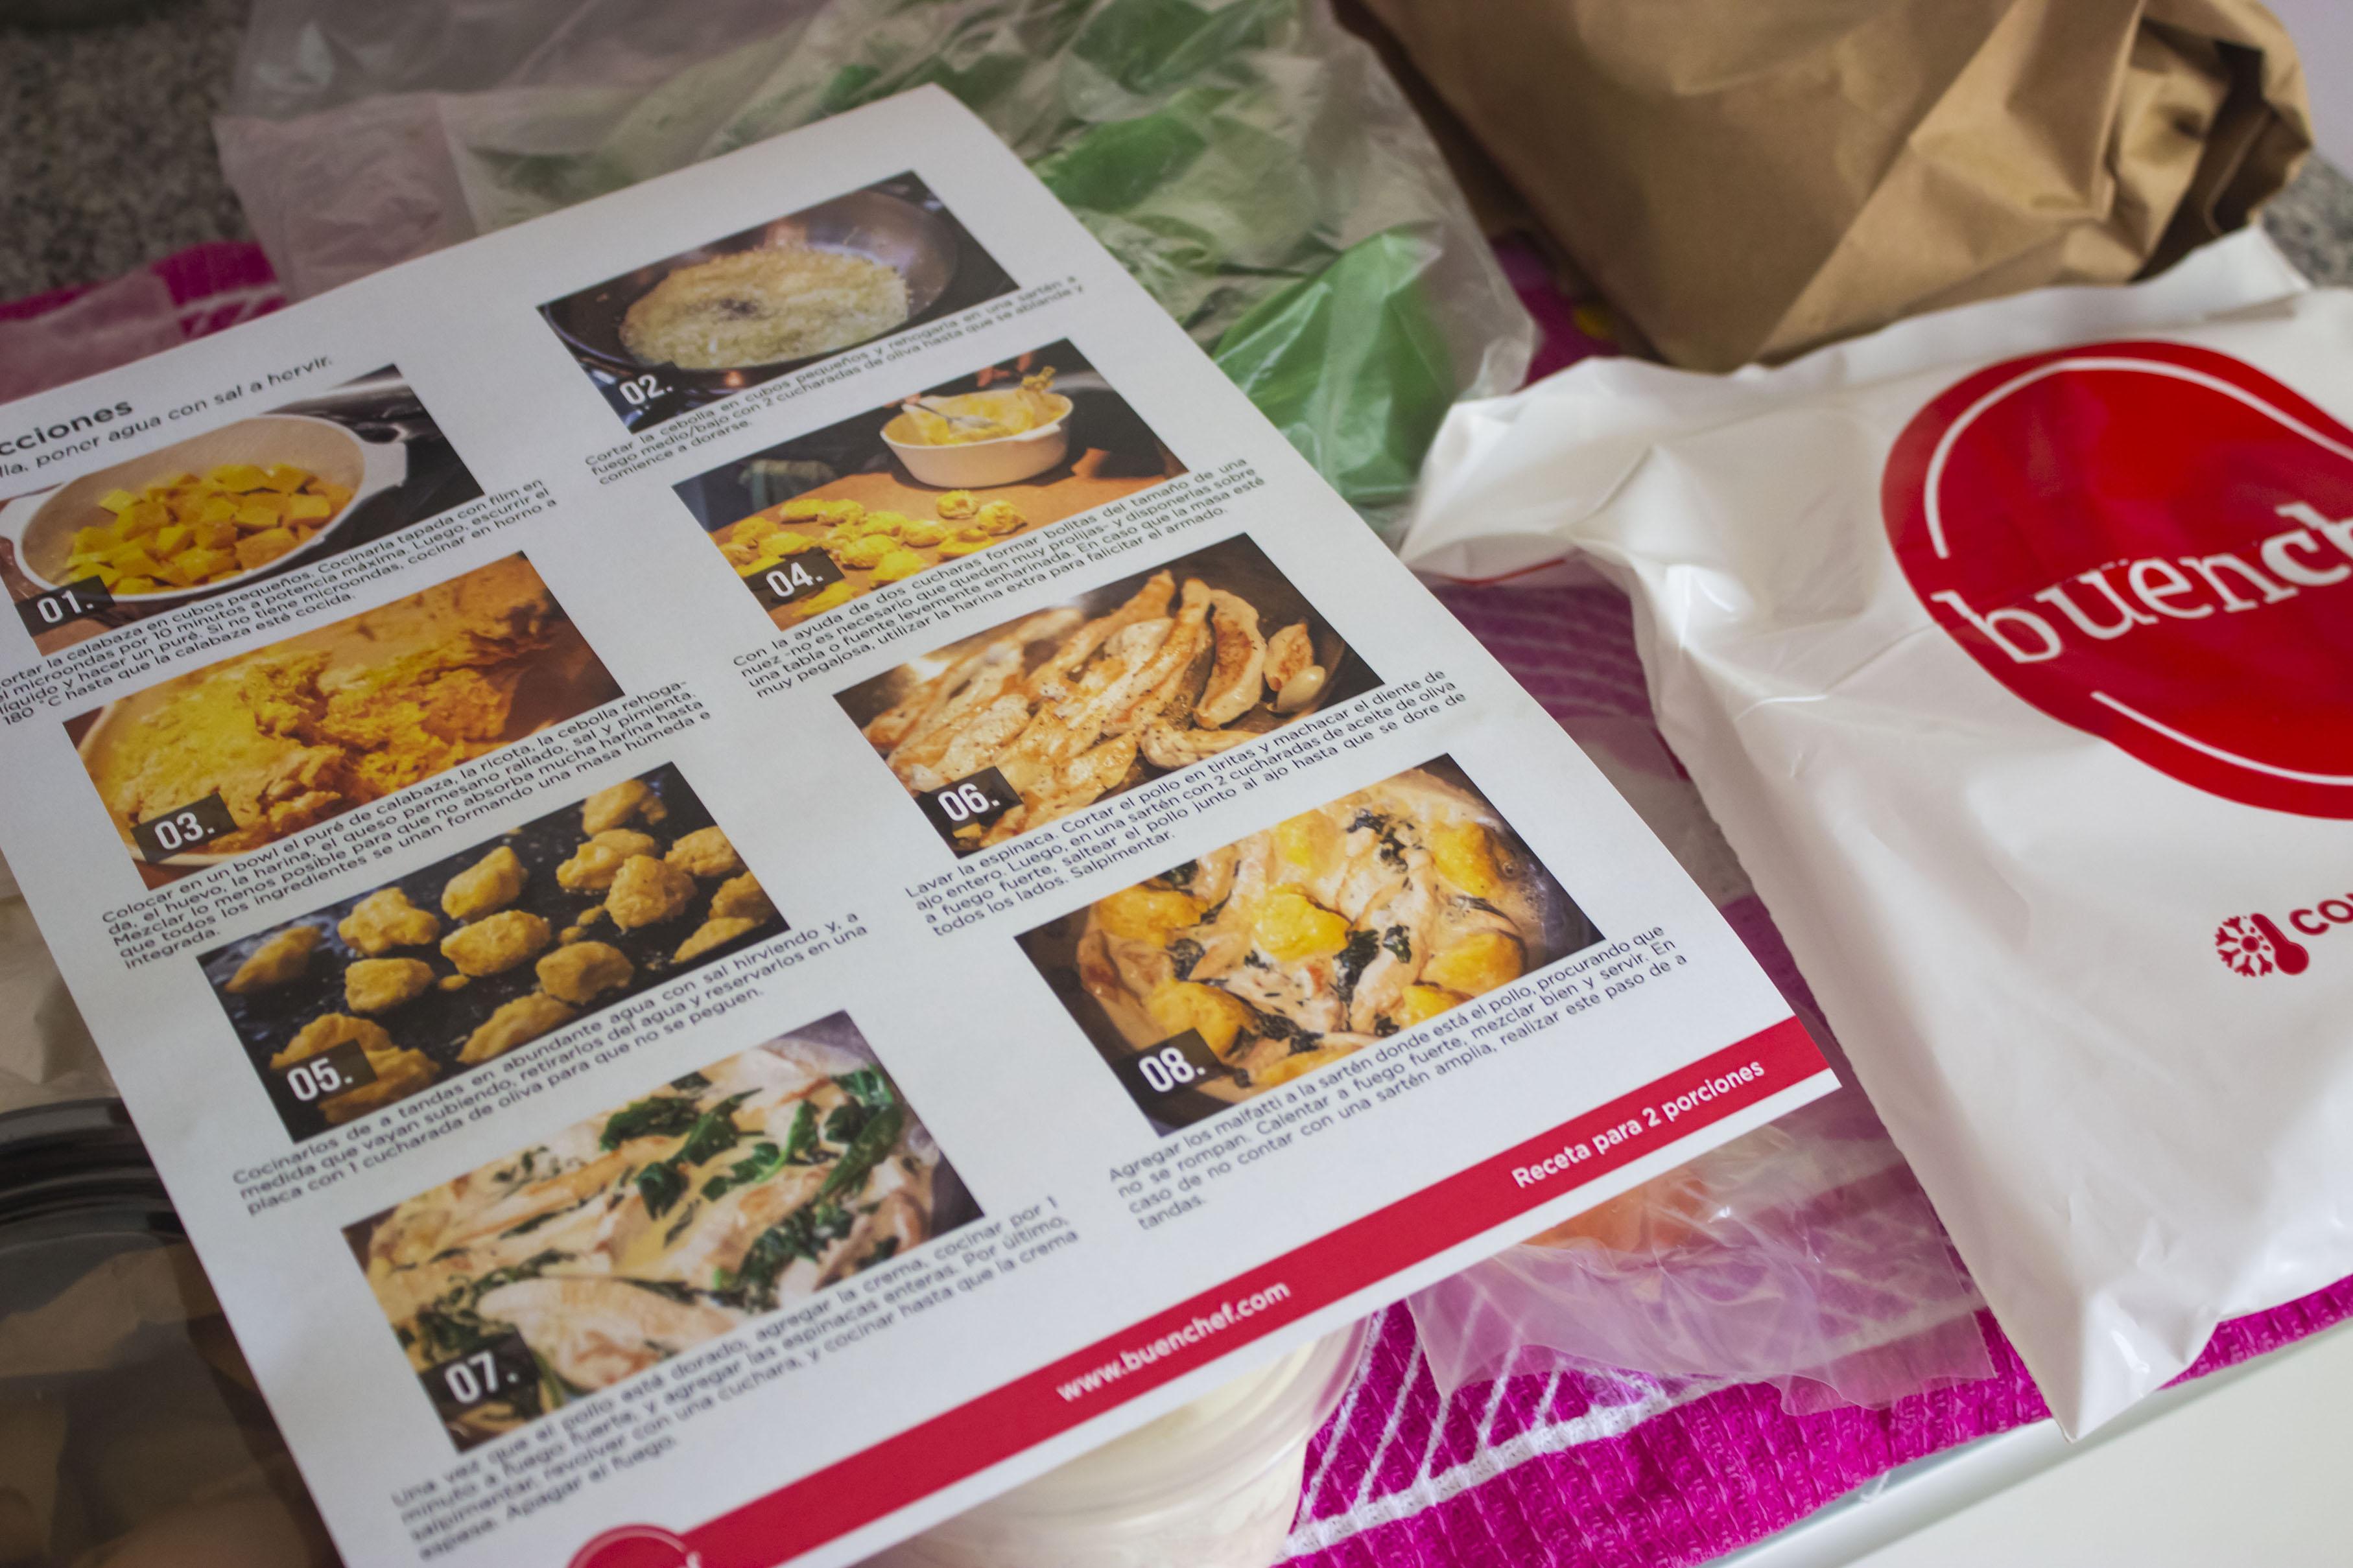 La receta de los Malfatti - Buen Chef